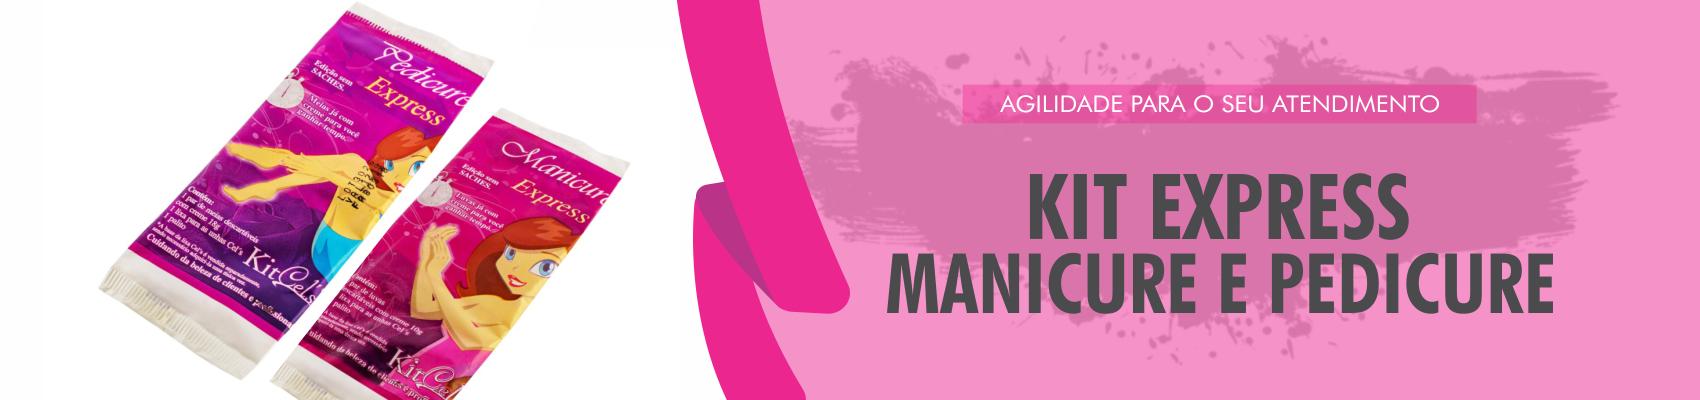 KIT EXPRESS DUO MANICURE/PEDICURE